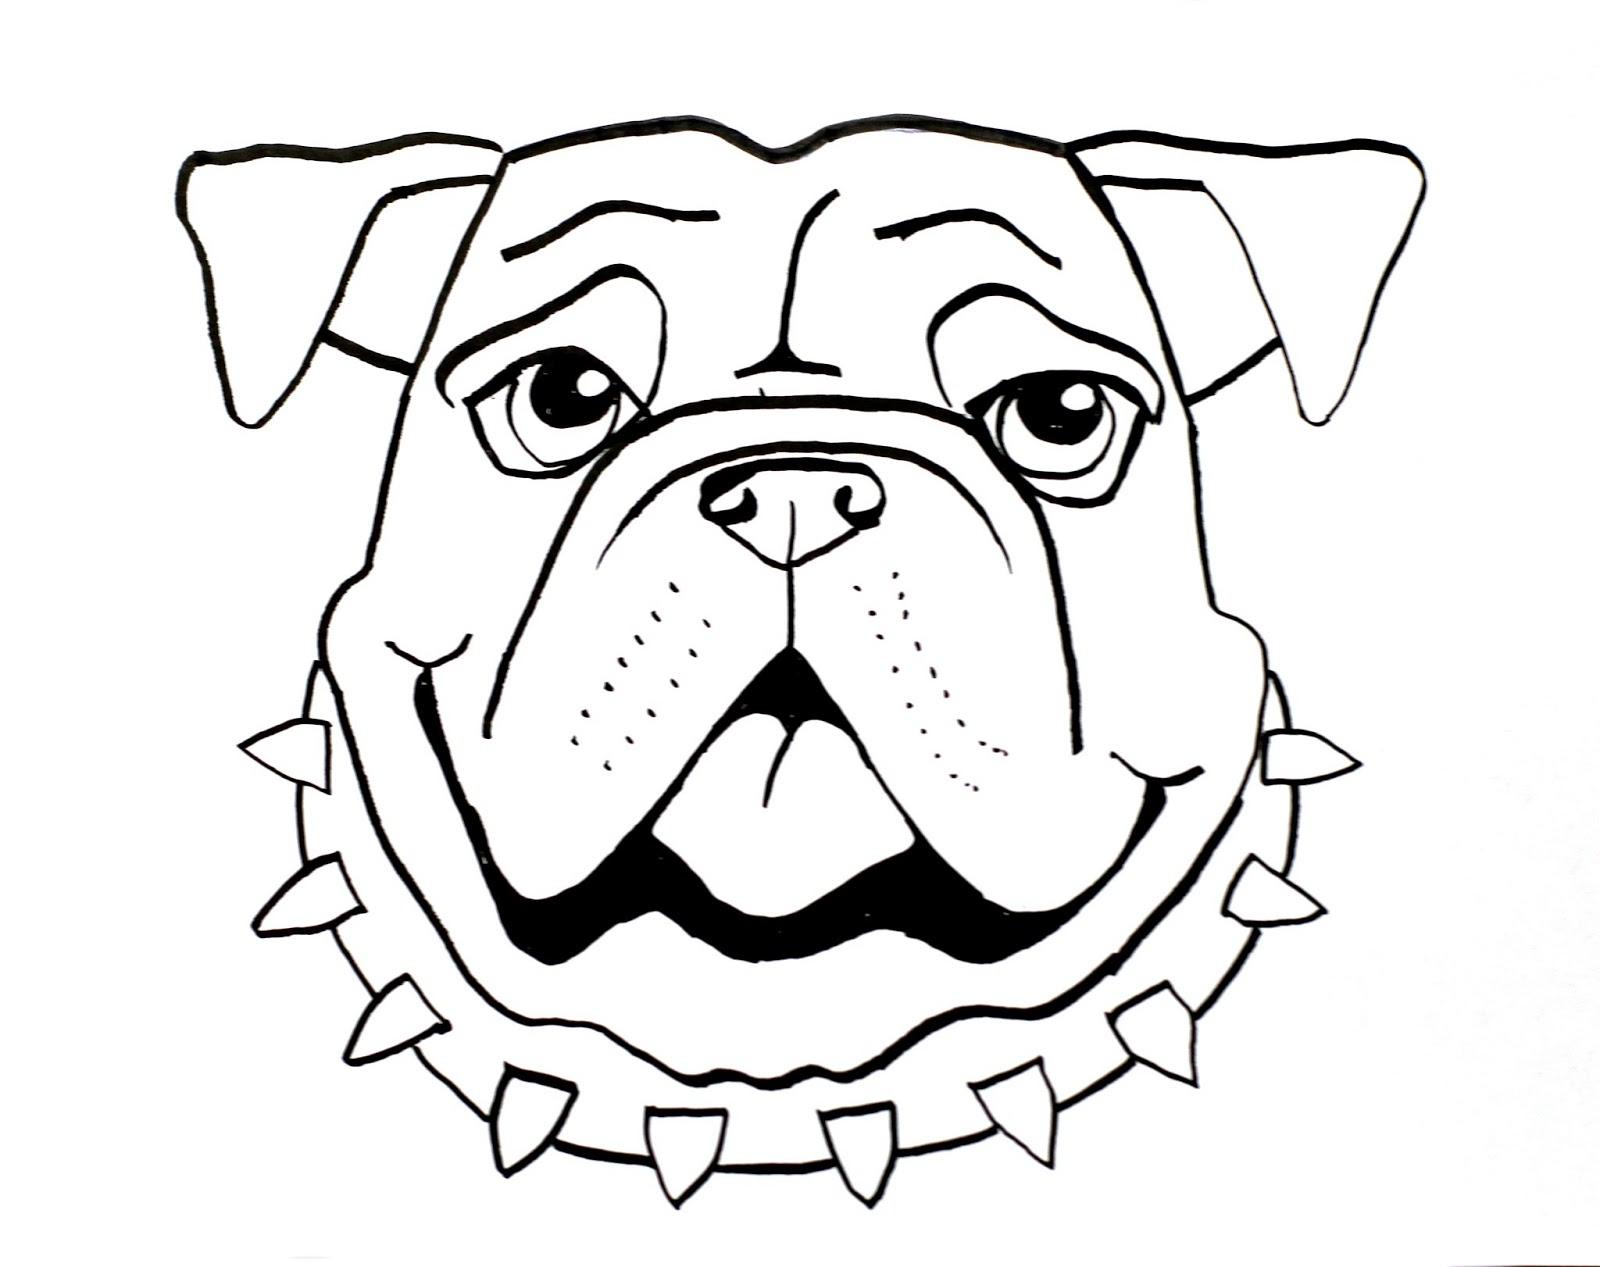 1600x1267 Drawing Of A Bulldog Smart Class Bull Dog Draw A Long